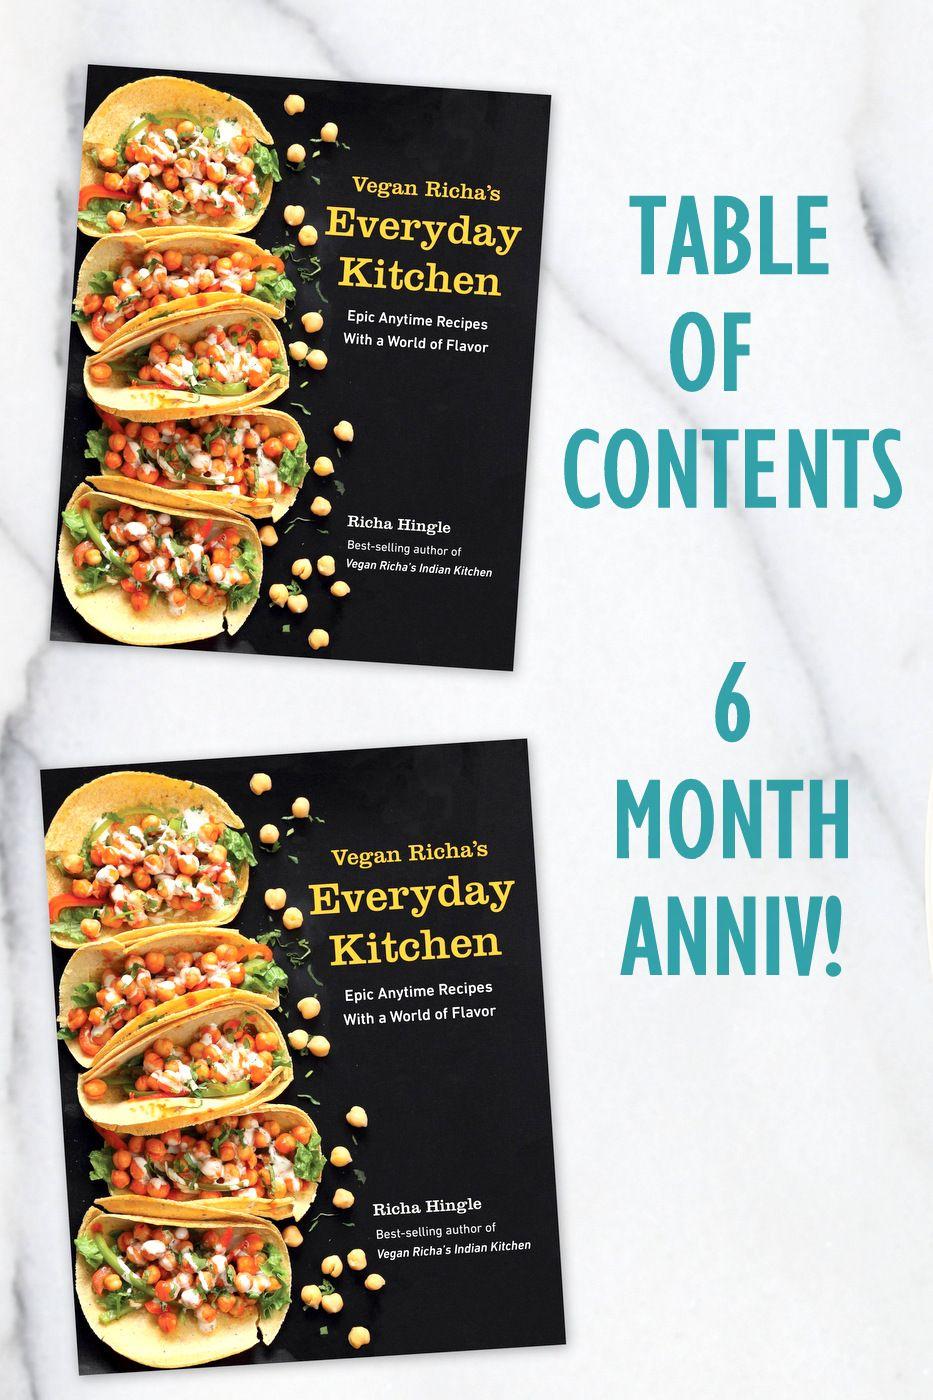 6 Month Anniv Table Of Contents And Tips Vegan Richa S Everyday Kitchen Cookbook Vegan Richa Kitchen Cookbook Savory Vegan Vegan Richa